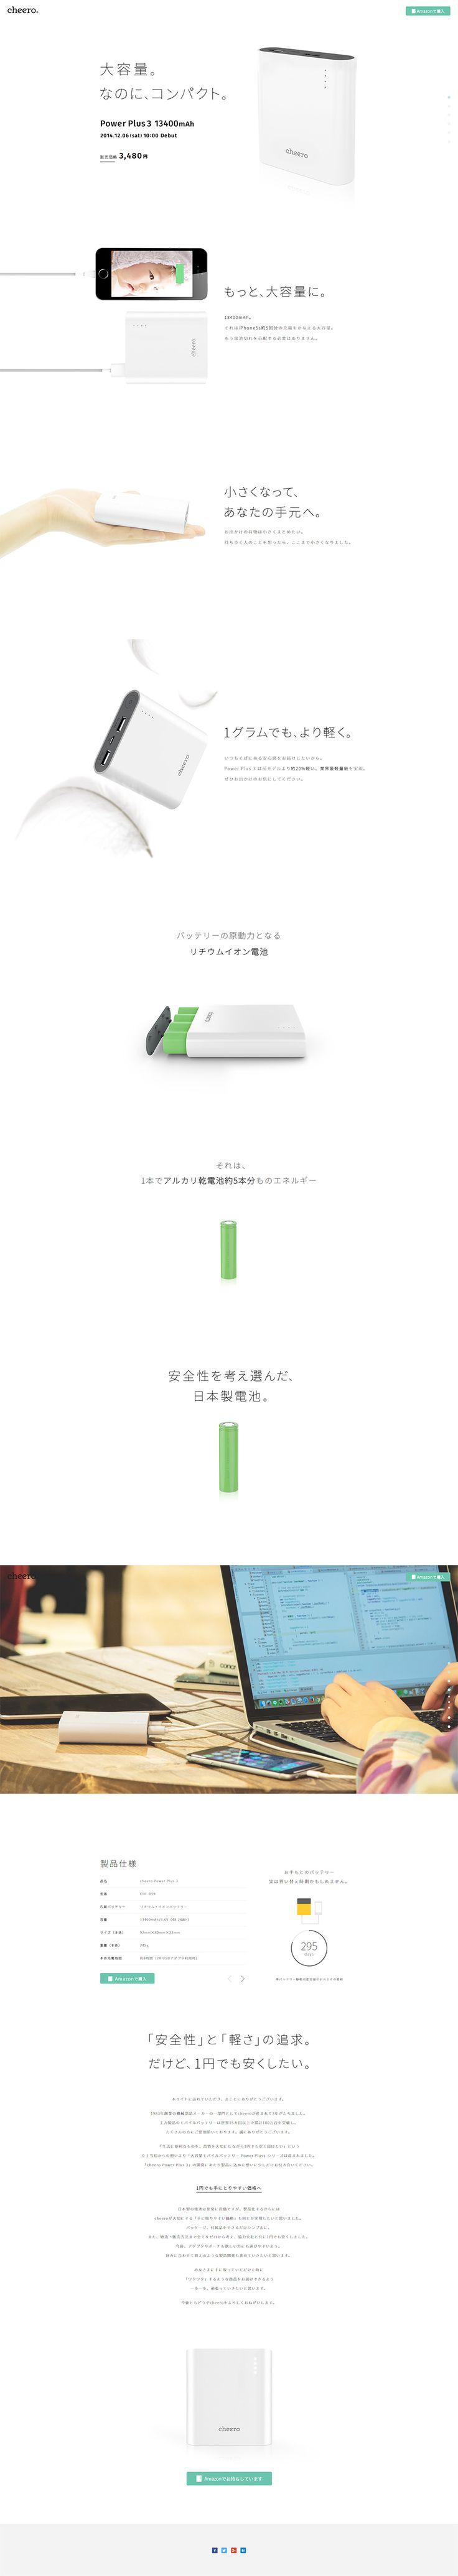 cheero【家電・パソコン・通信関連】のLPデザイン。WEBデザイナーさん必見!ランディングページのデザイン参考に(シンプル系)